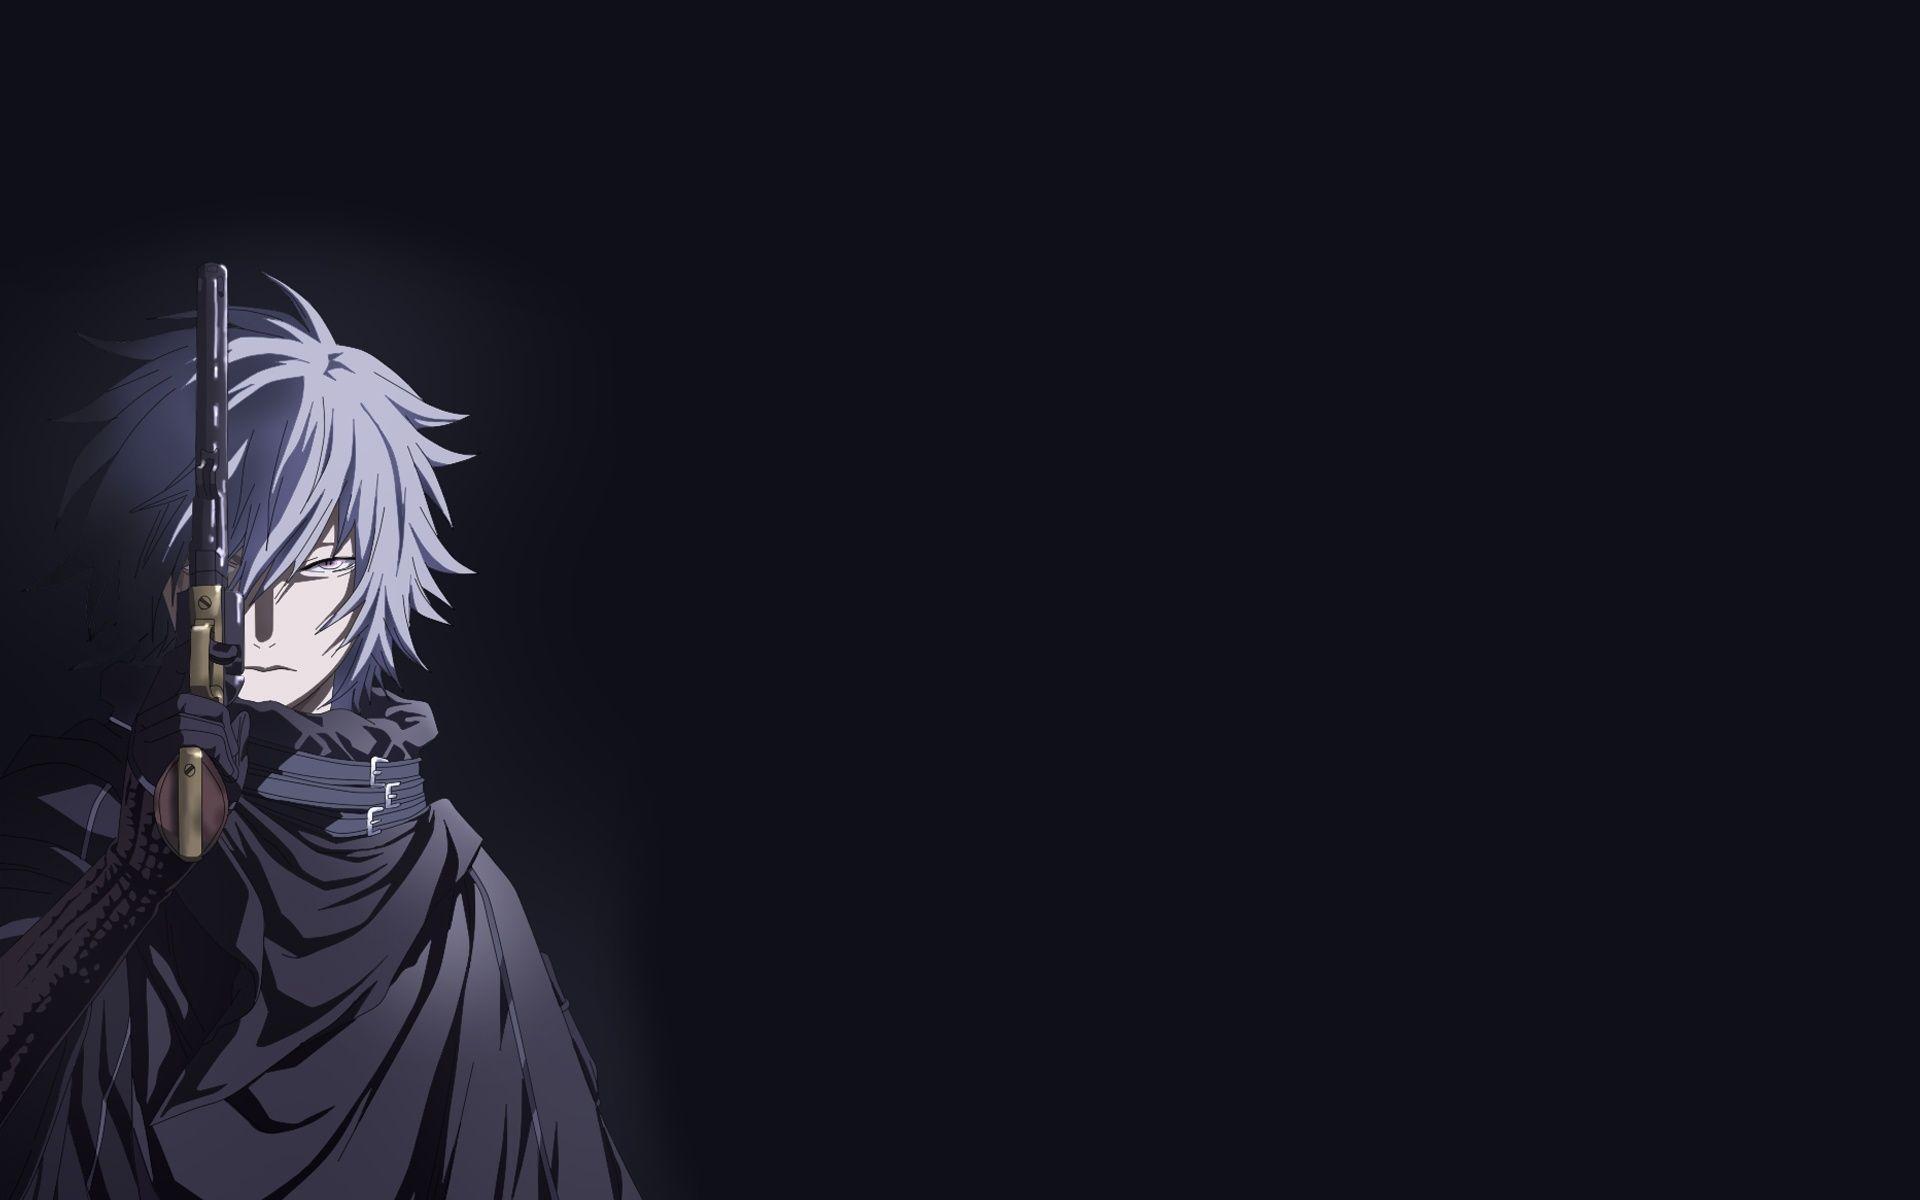 dark anime desktop wallpaper 60129